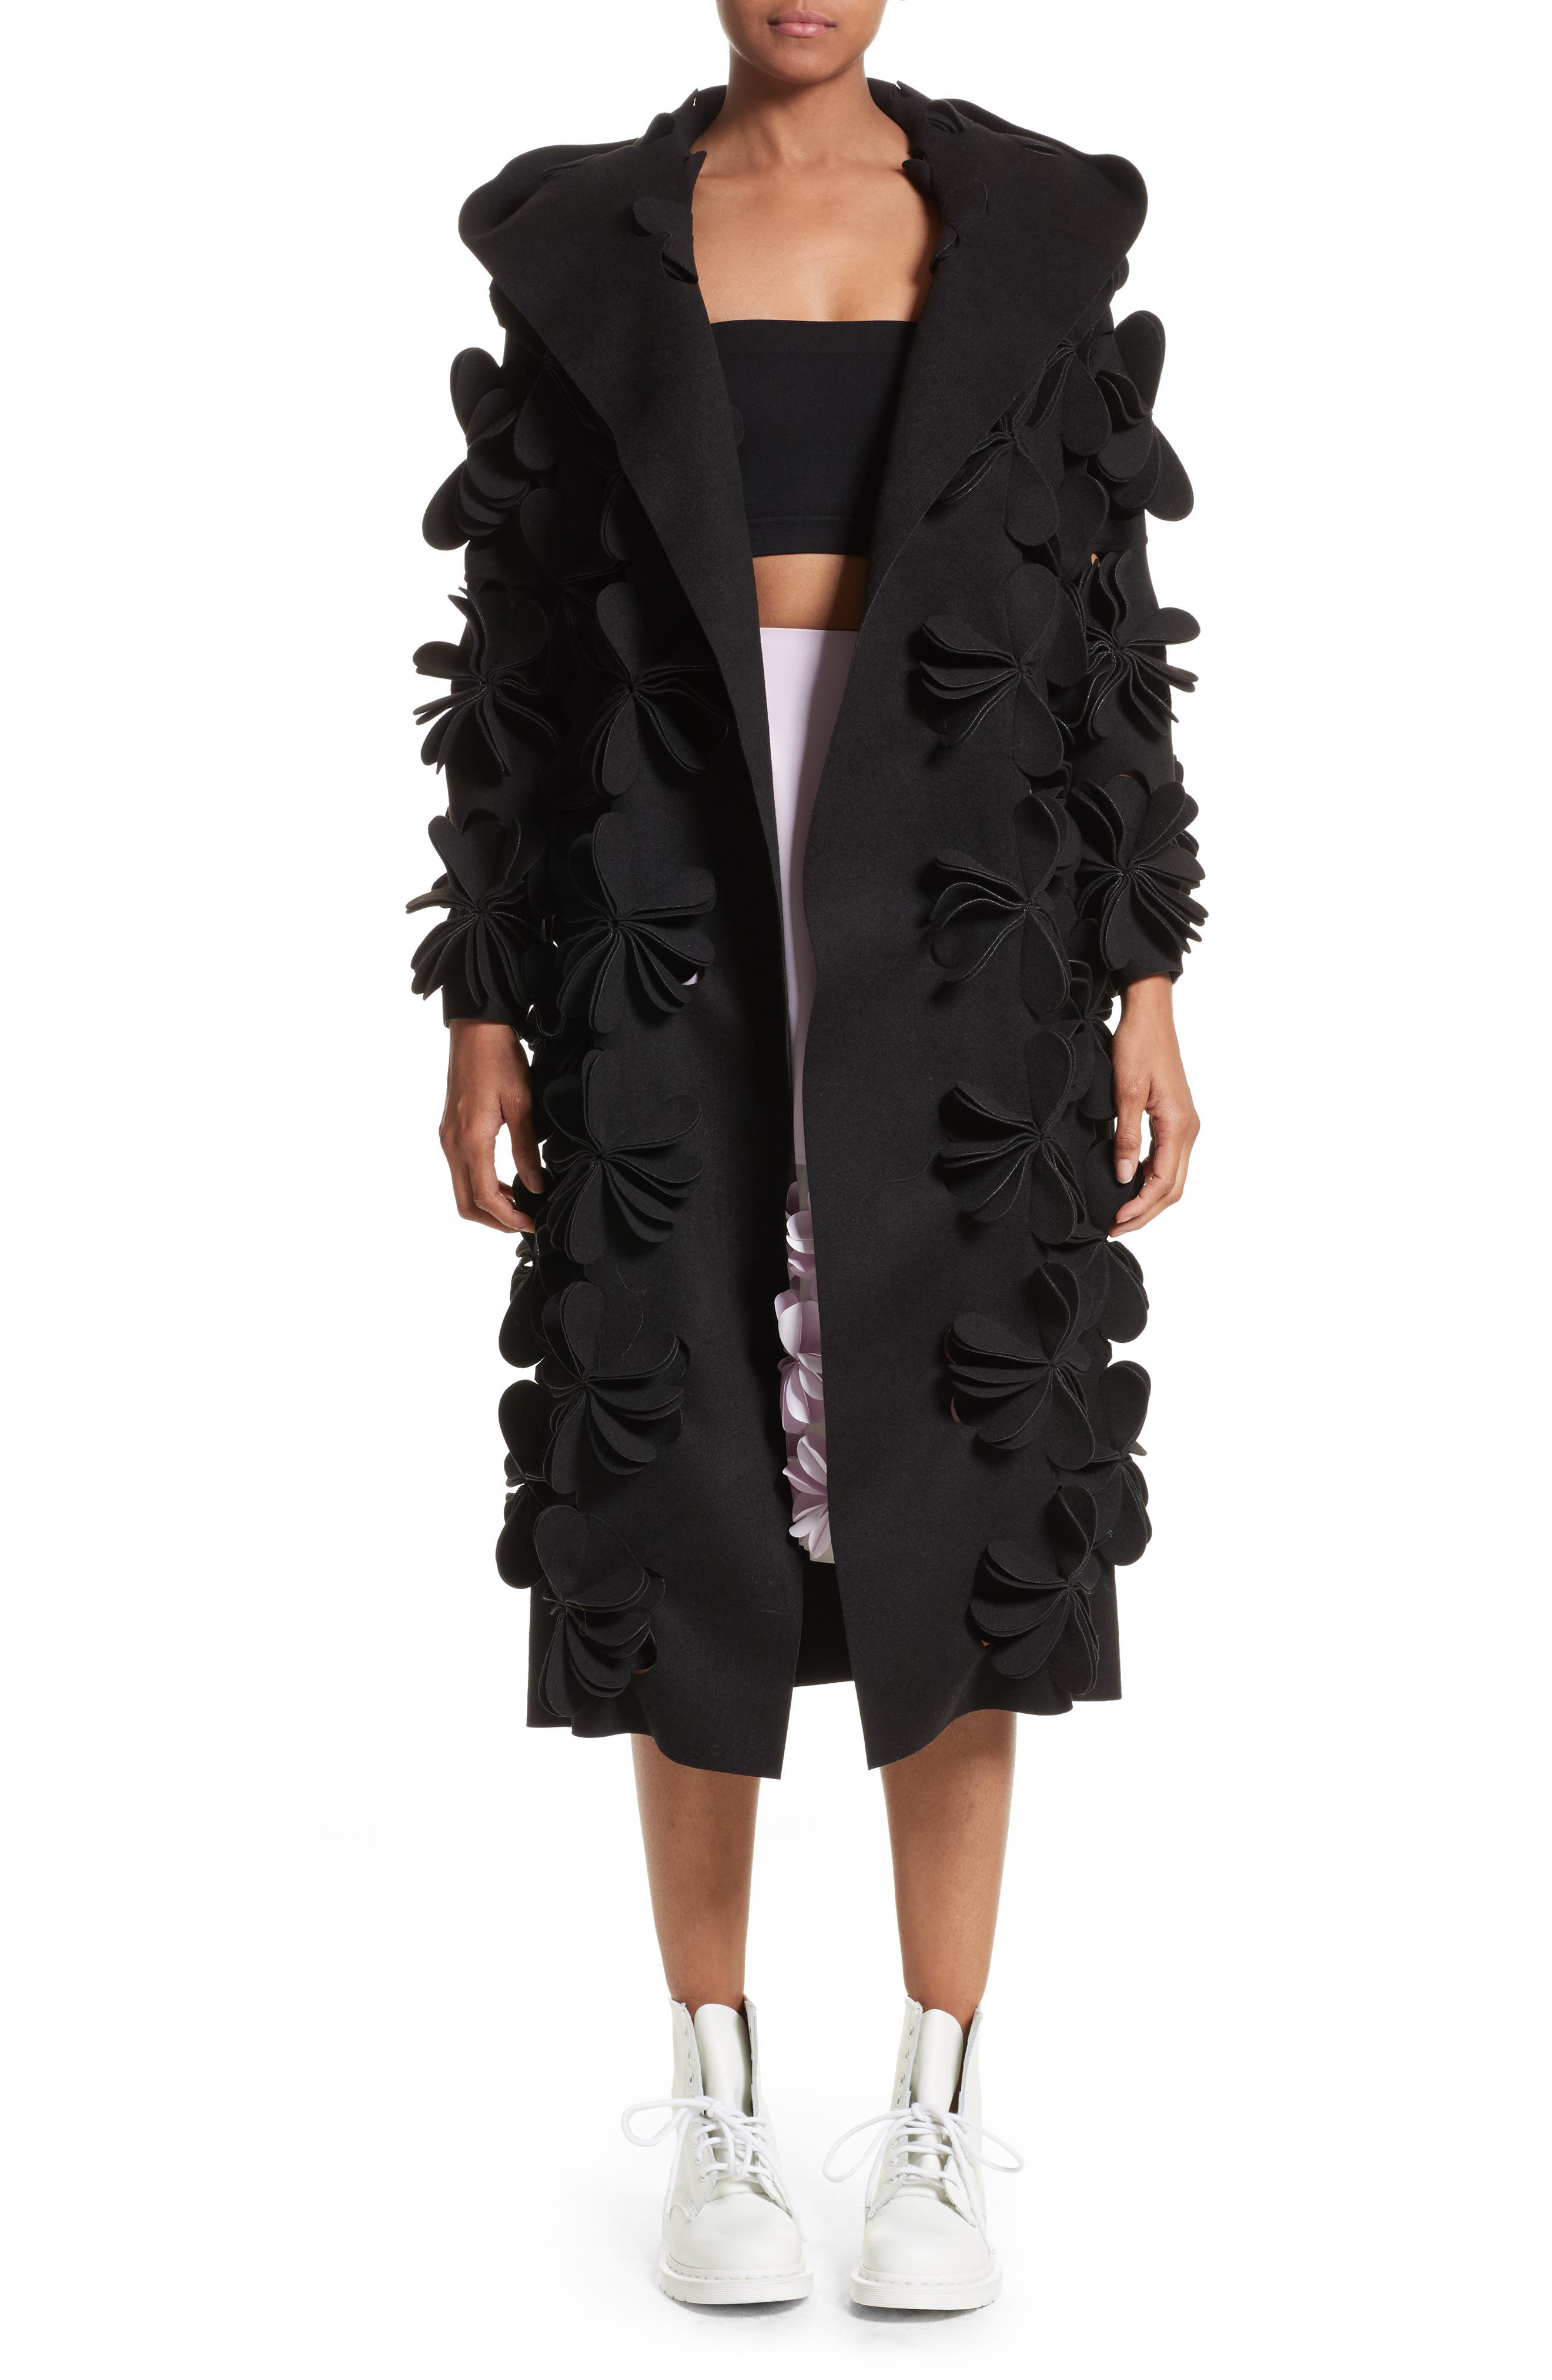 Floral Appliqué Hooded Coat,                         Main,                         color, Black